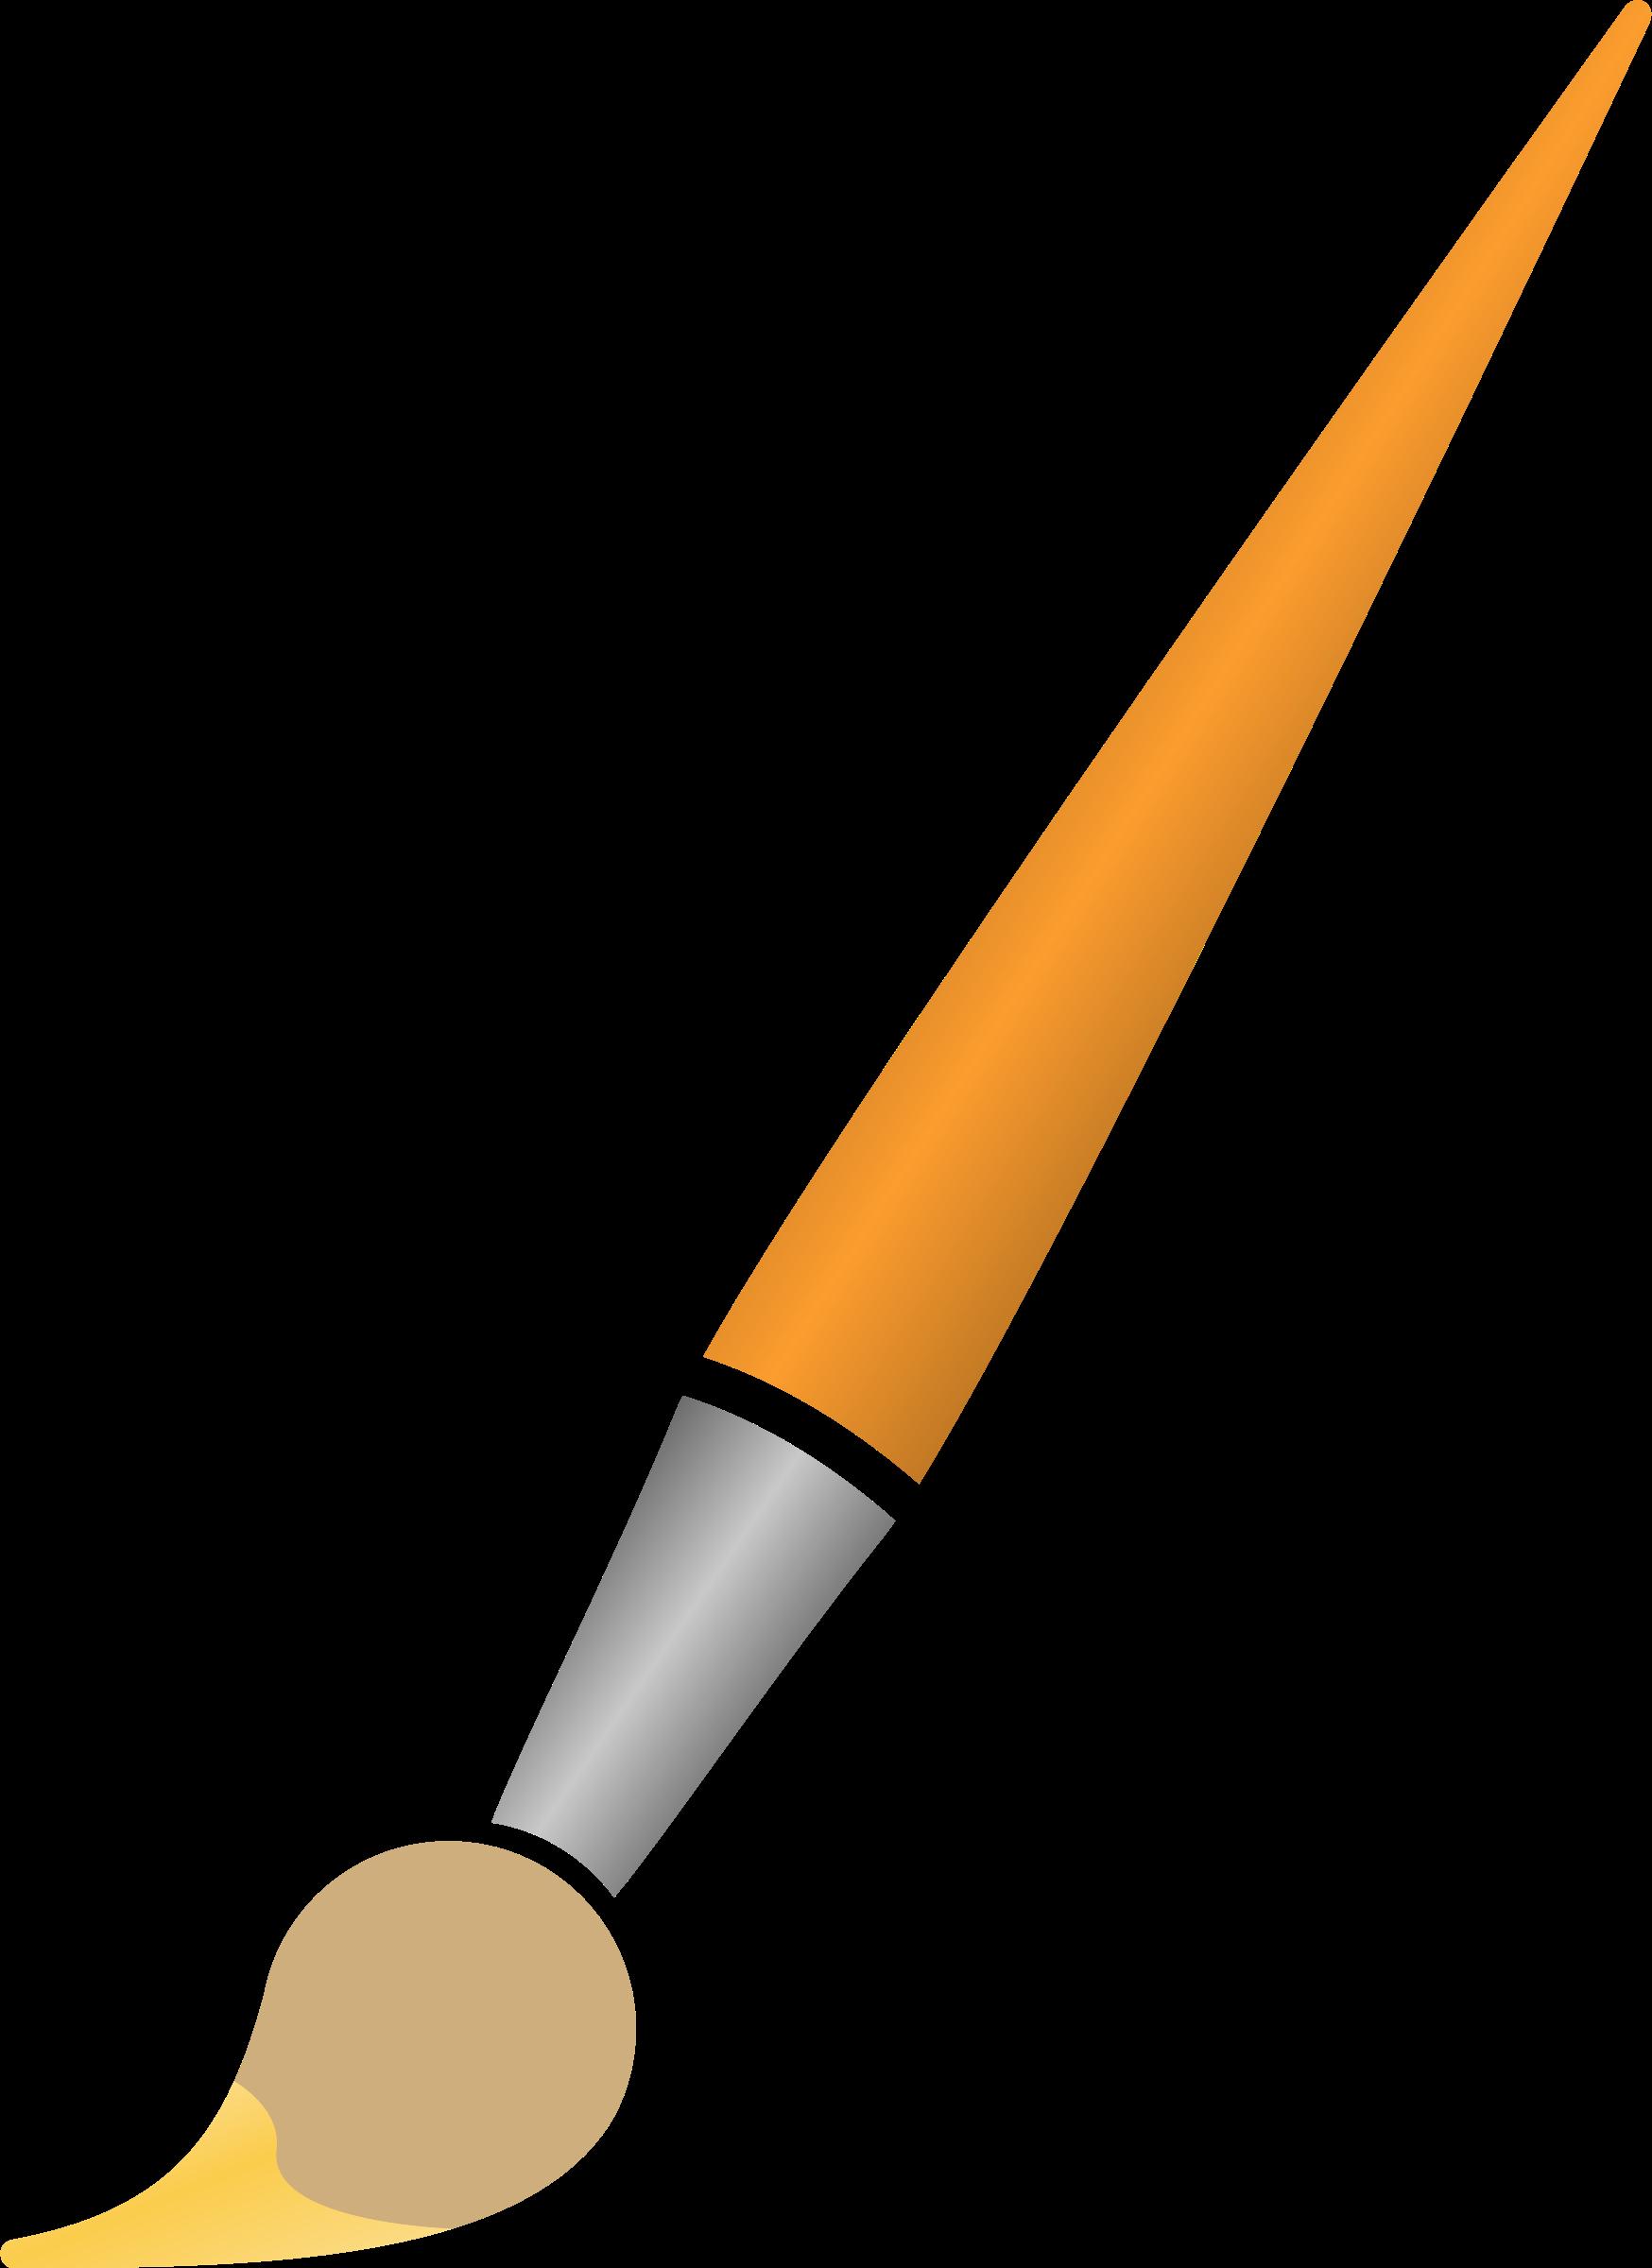 Paint brush with yellow. Paintbrush clipart green paintbrush